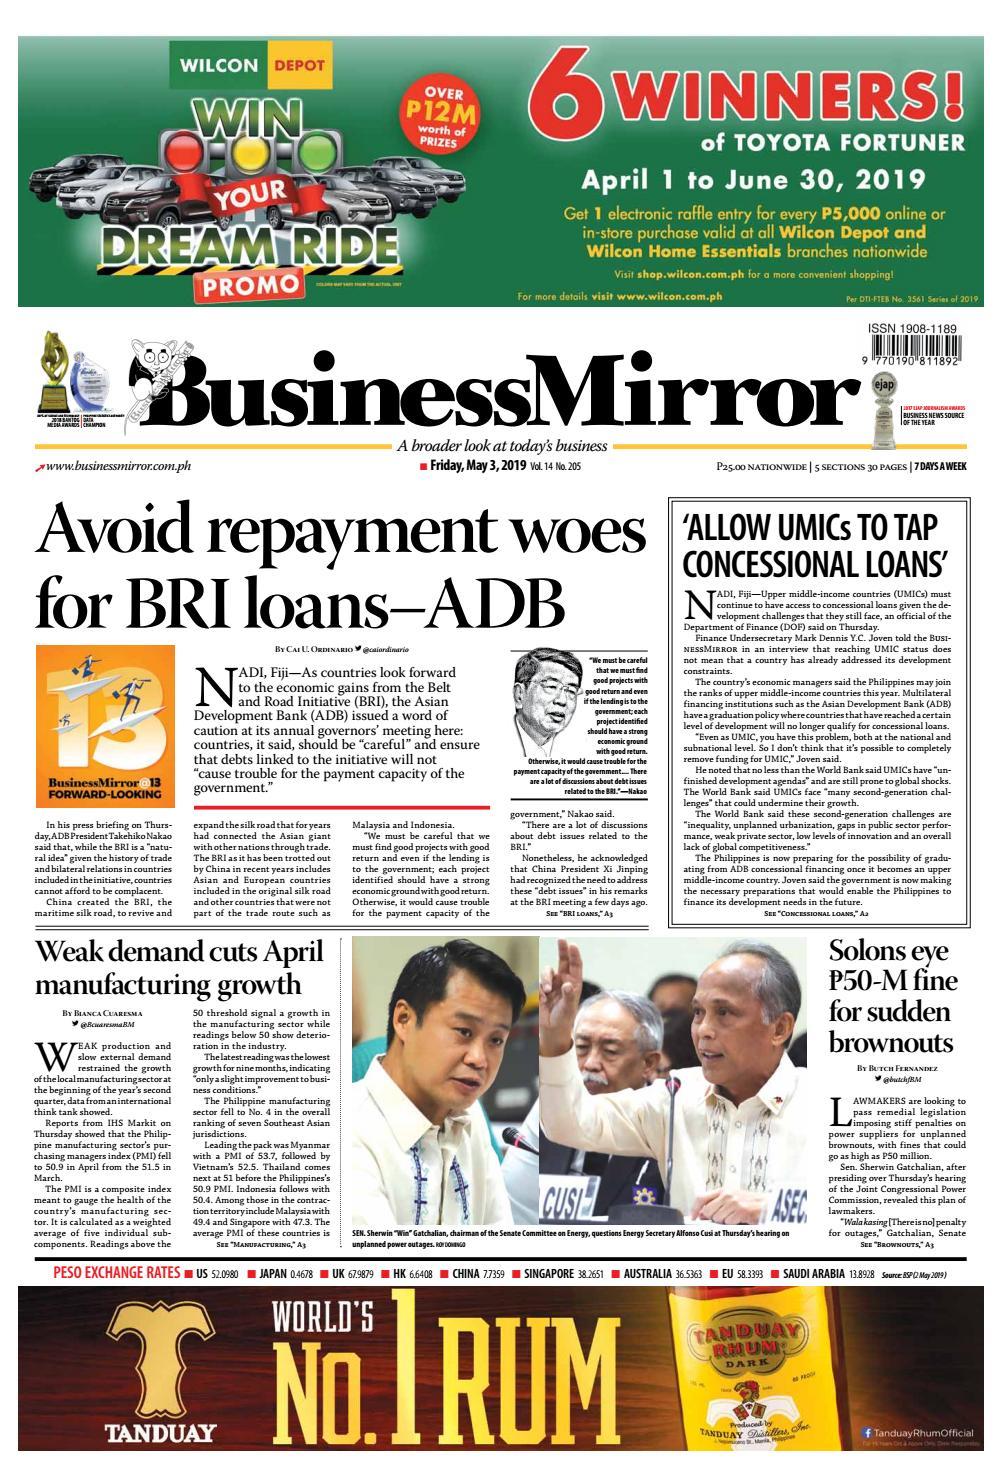 Businessmirror May 03, 2019 pdf by BusinessMirror - issuu